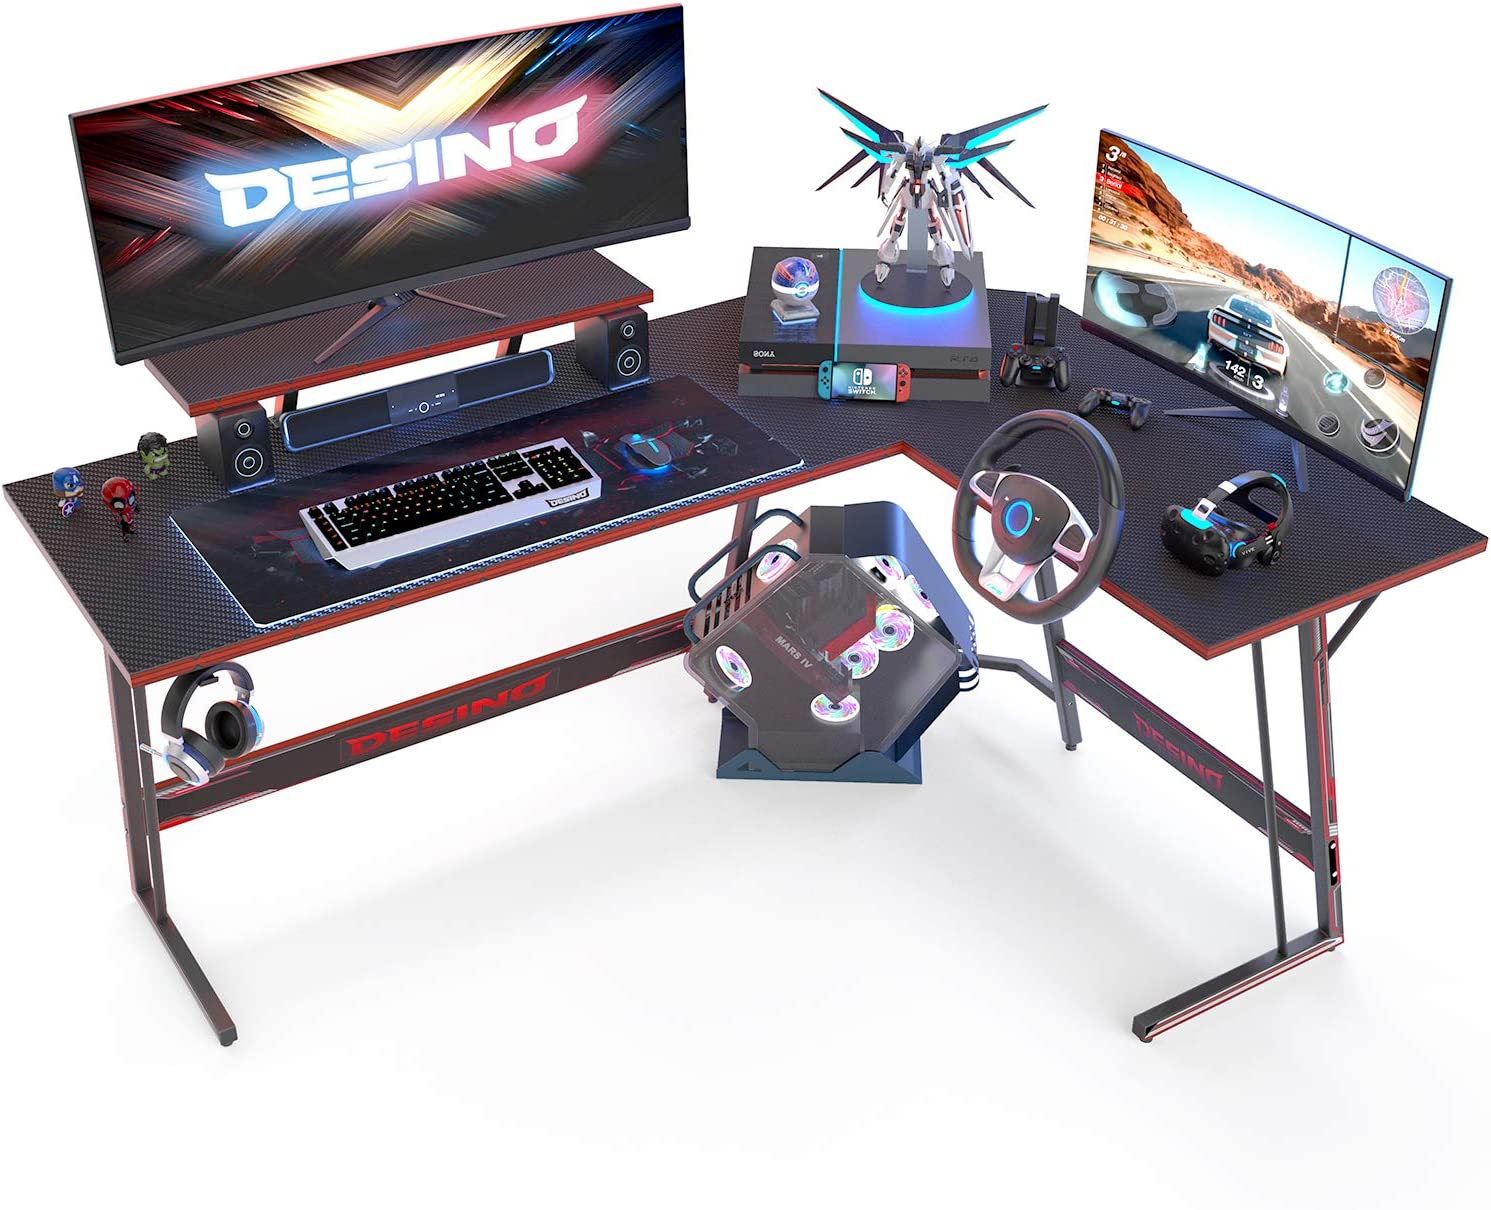 DESINO L Shaped Gaming Desk Computer Coner Desk PC Wirting Table Gamer Workstation for Home Office, Black